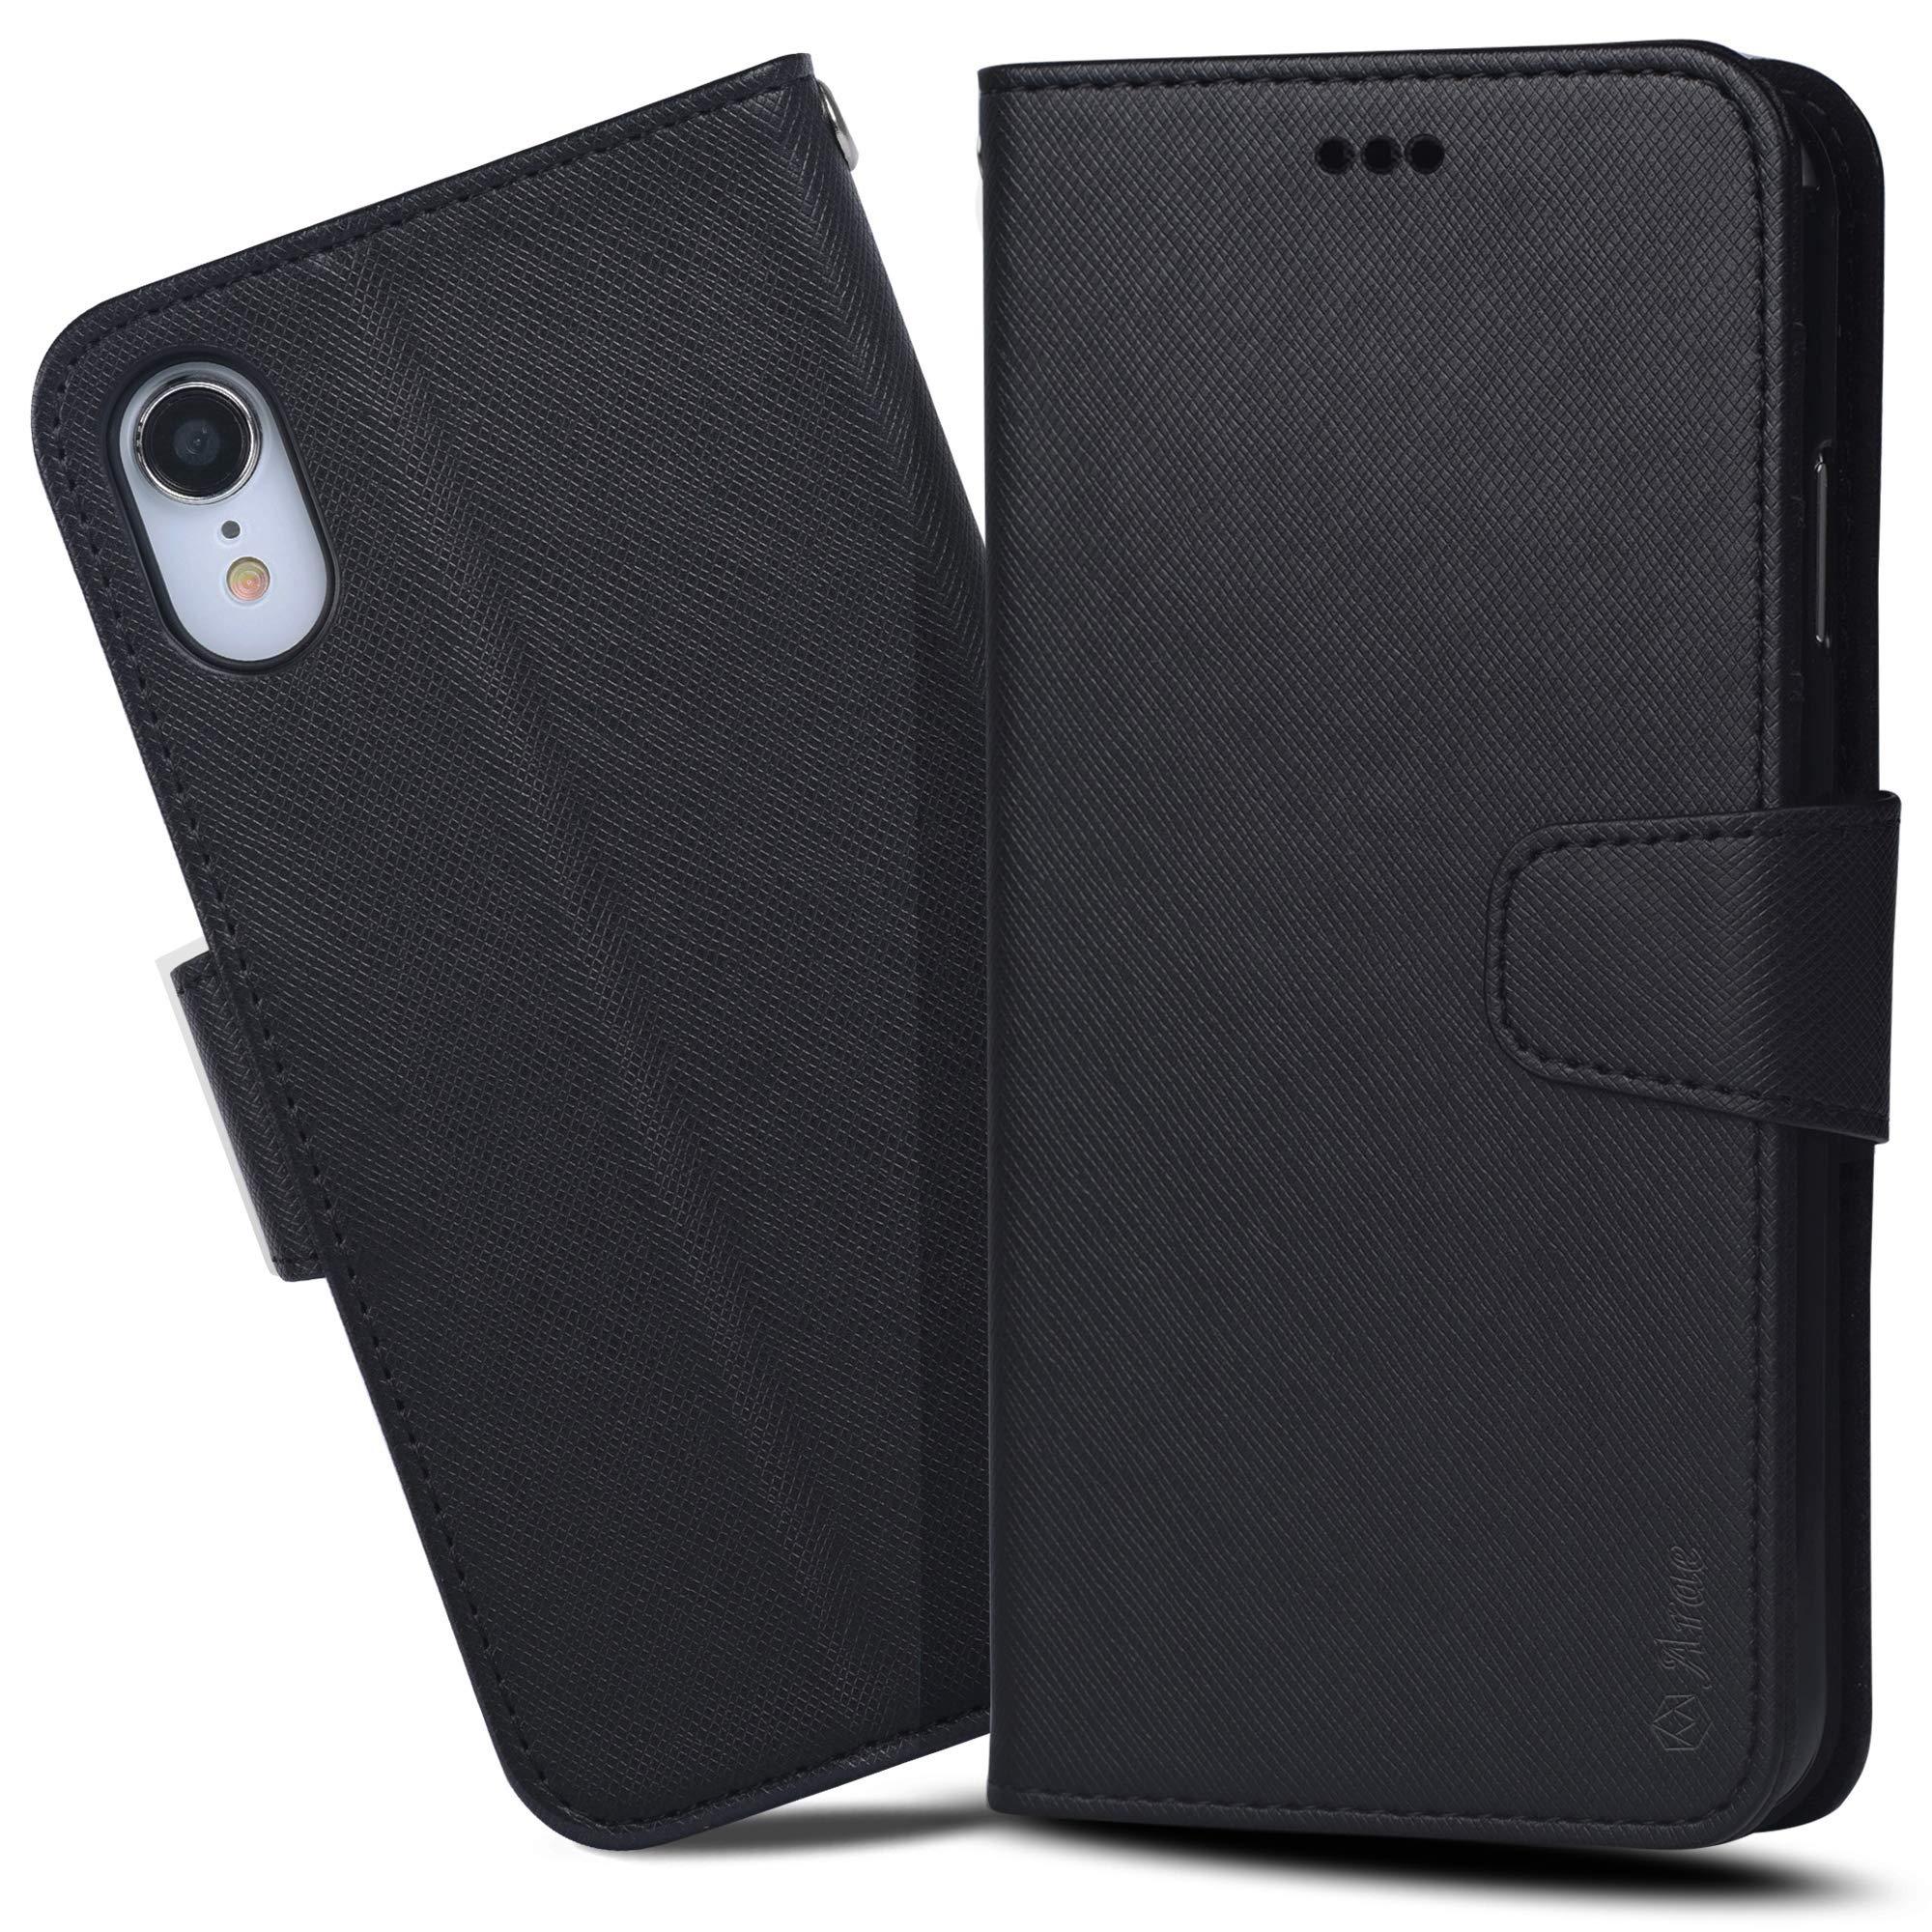 iPhone Xr ケース 手帳型 Arae ワイヤレス充電対応 スマホケース iPhoneXr ケース 横置き機能 カードポケット付き アイフォンXr 6.1インチ 2018 用 財布型 ケース カバー(ブラック)